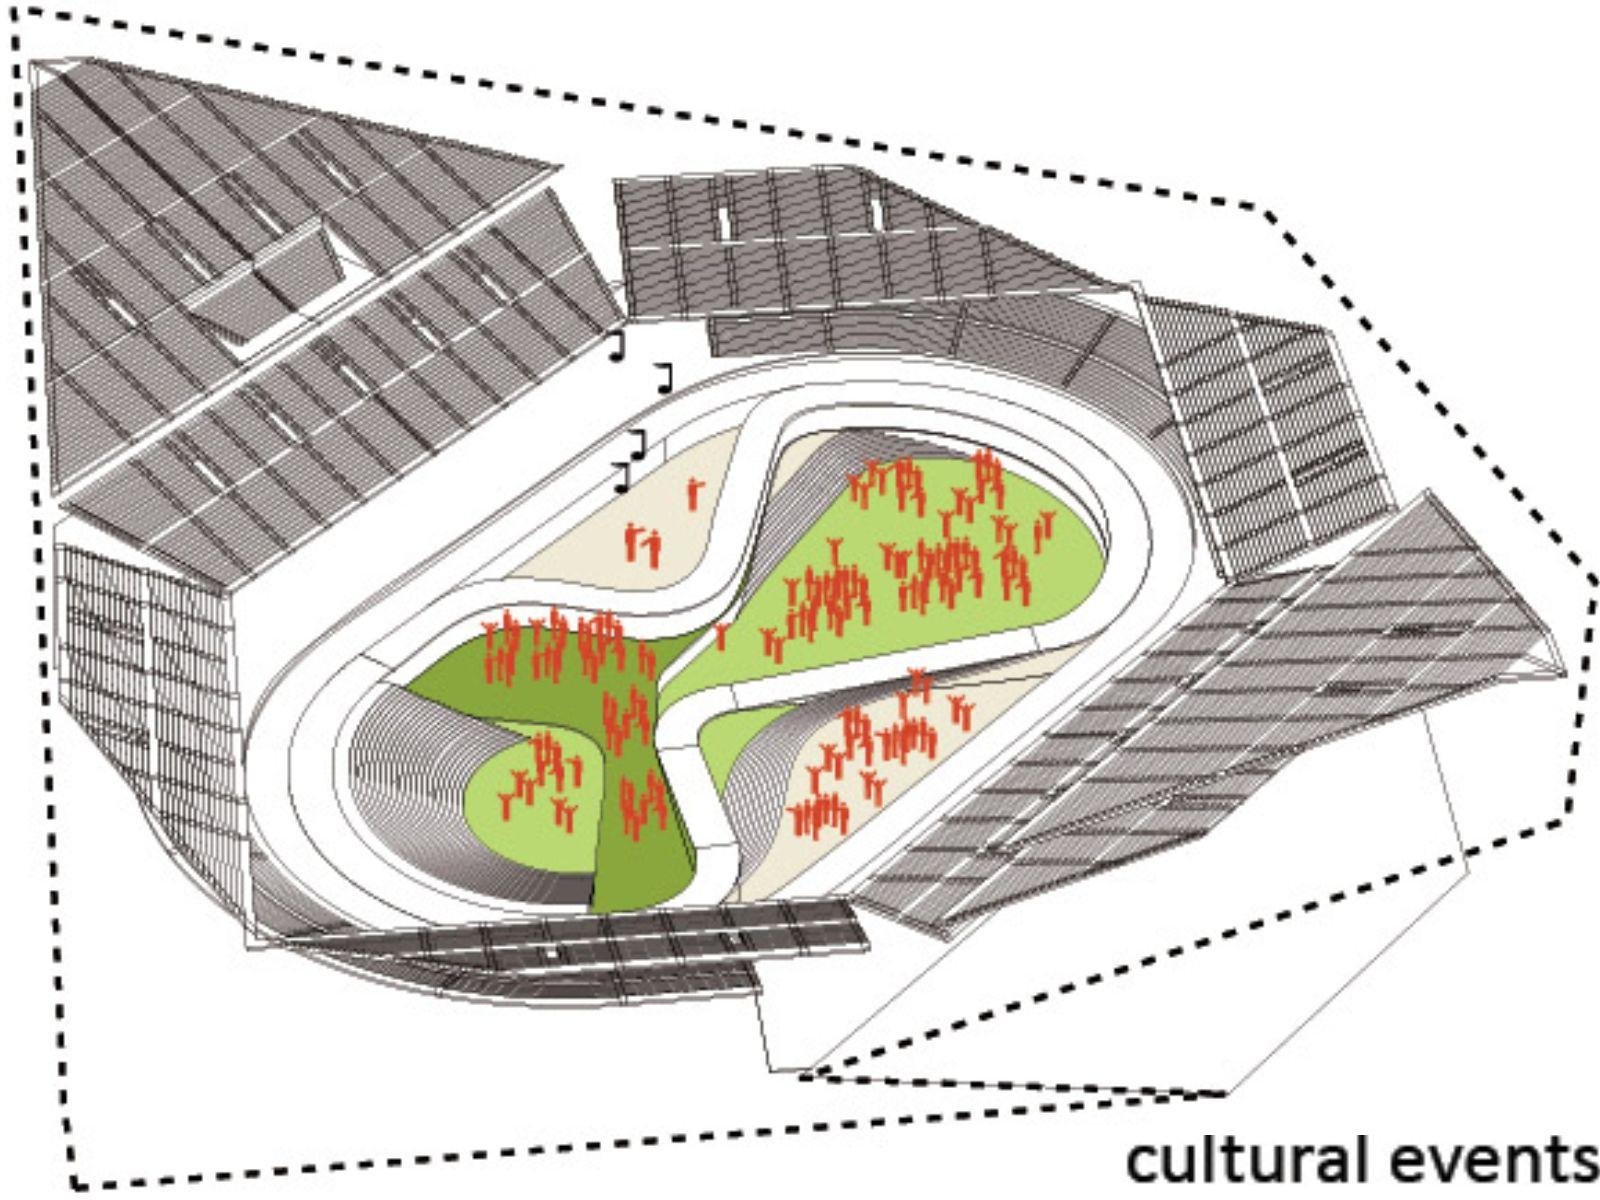 10-Brasilia-atletismo-Estadio-por-BF-arquitectura